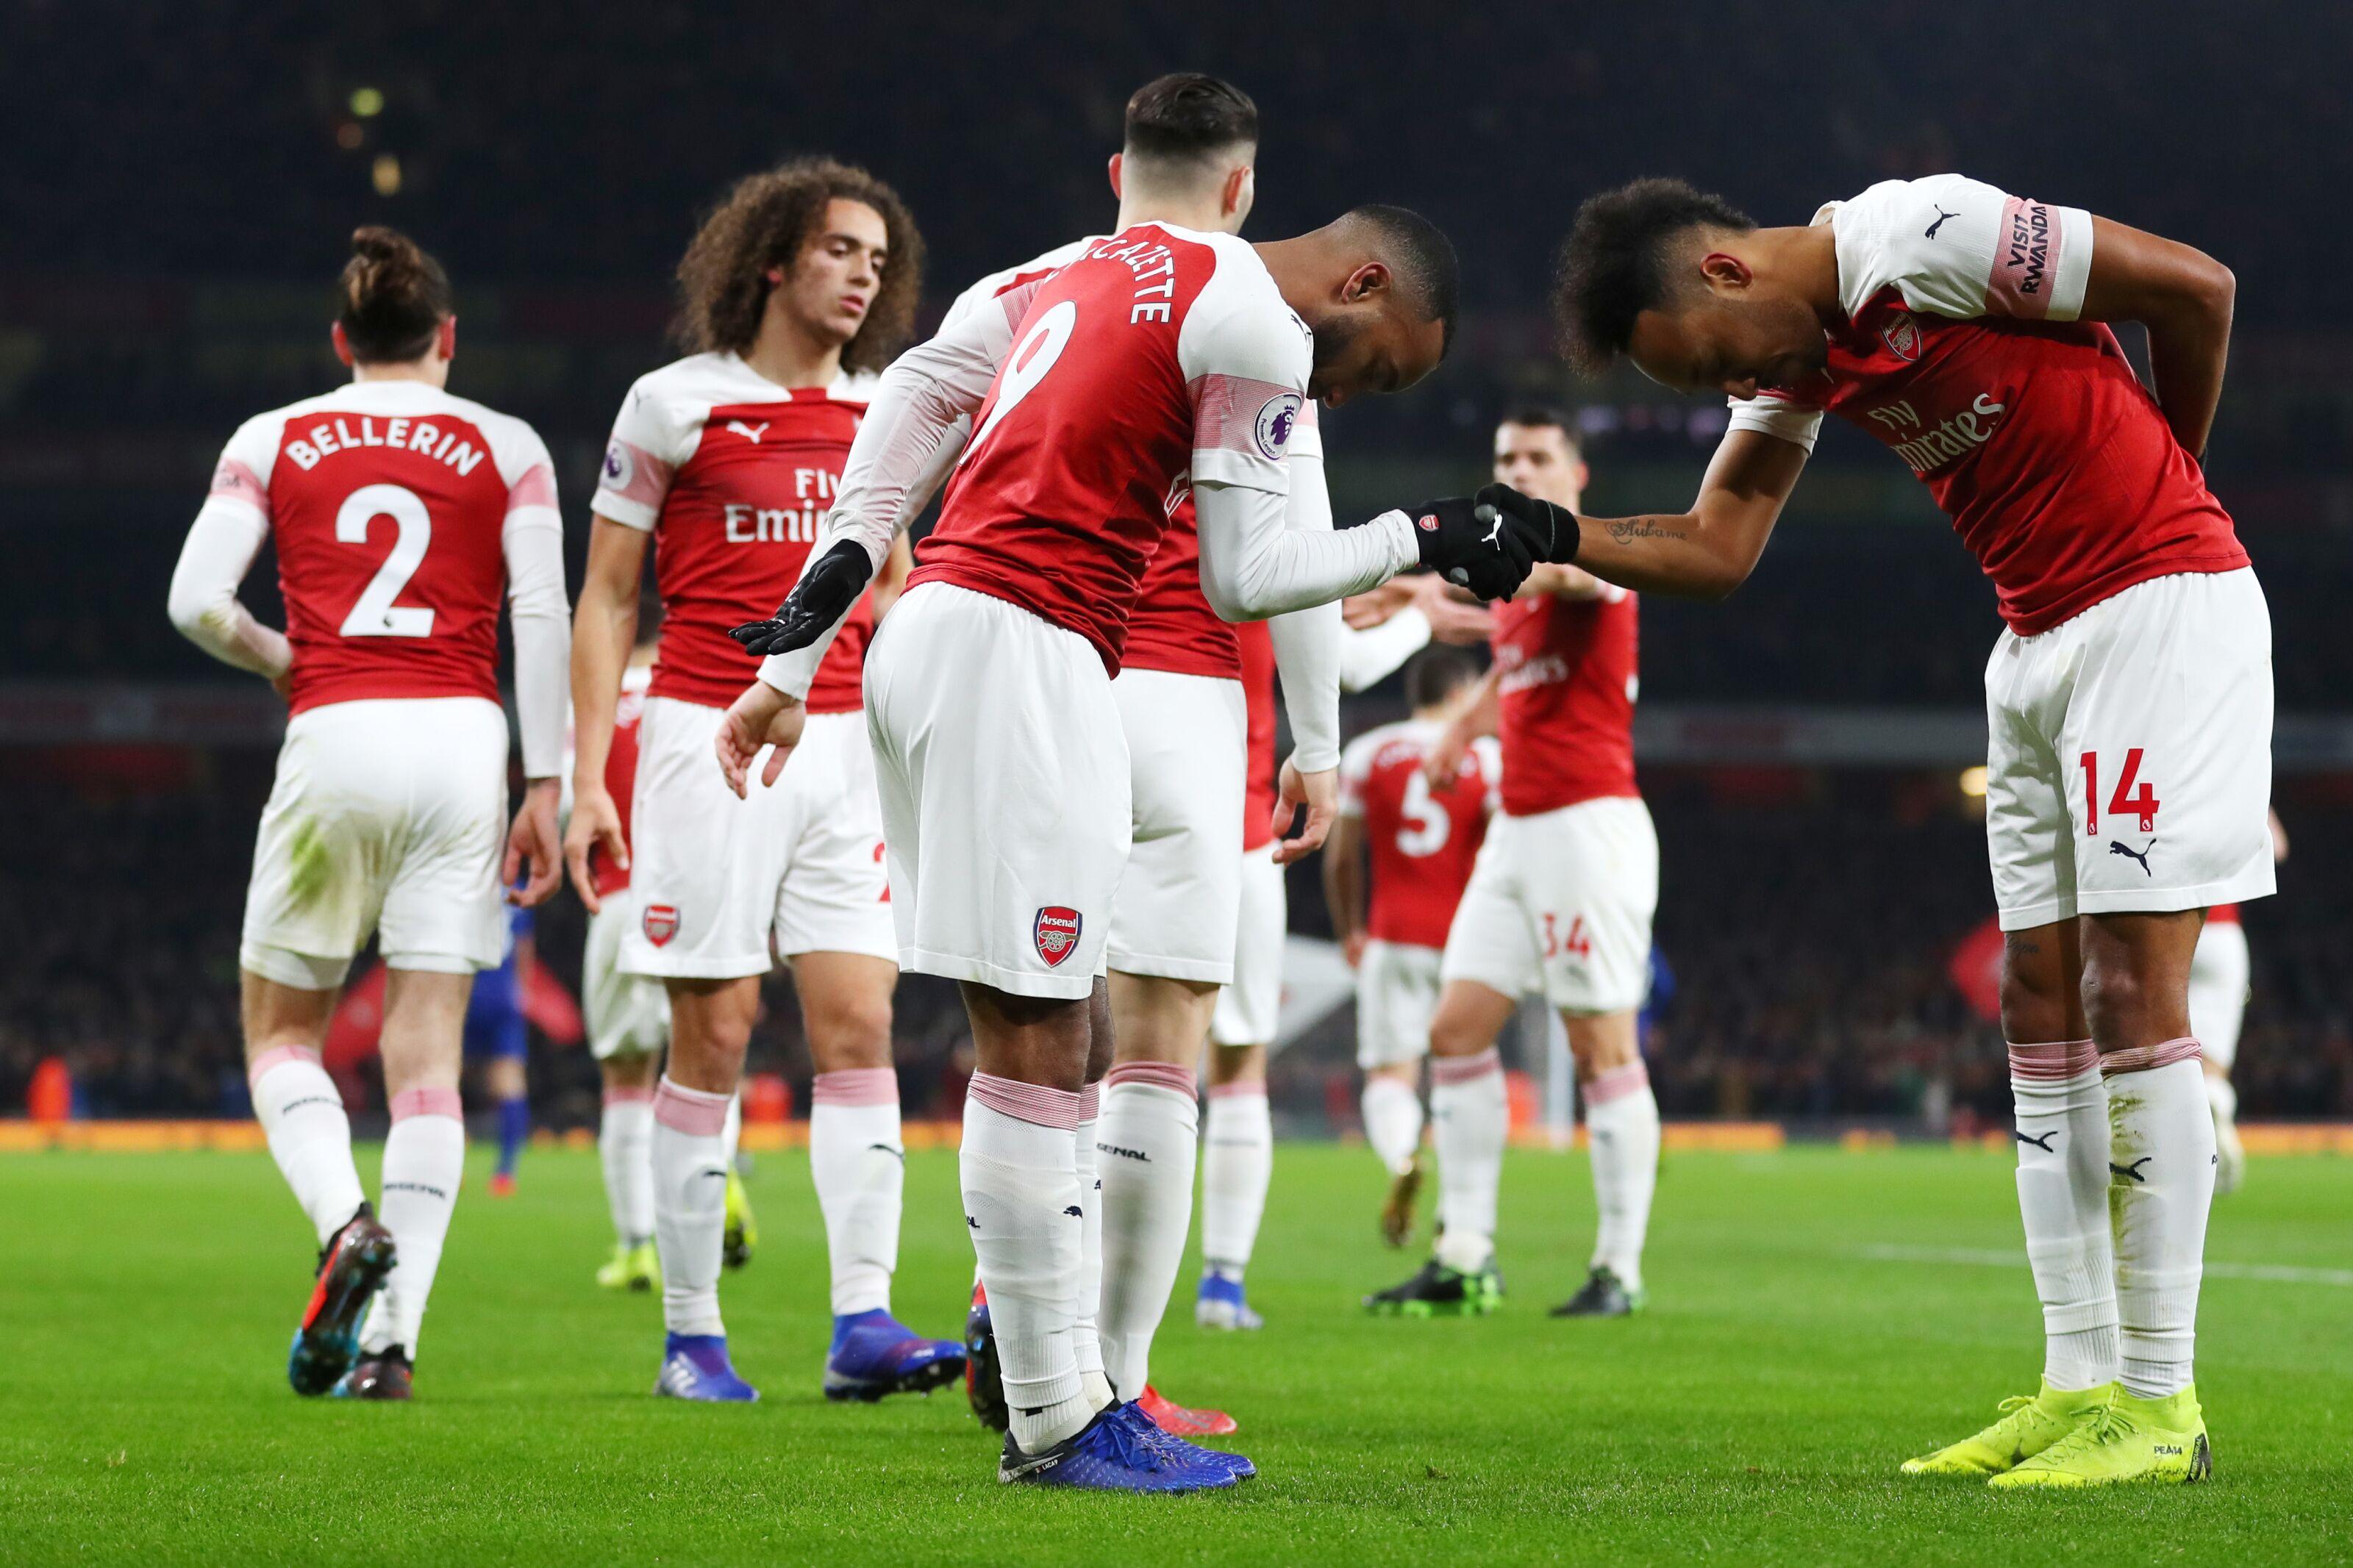 Arsenal: Alexandre Lacazette every bit Aubameyang's equal